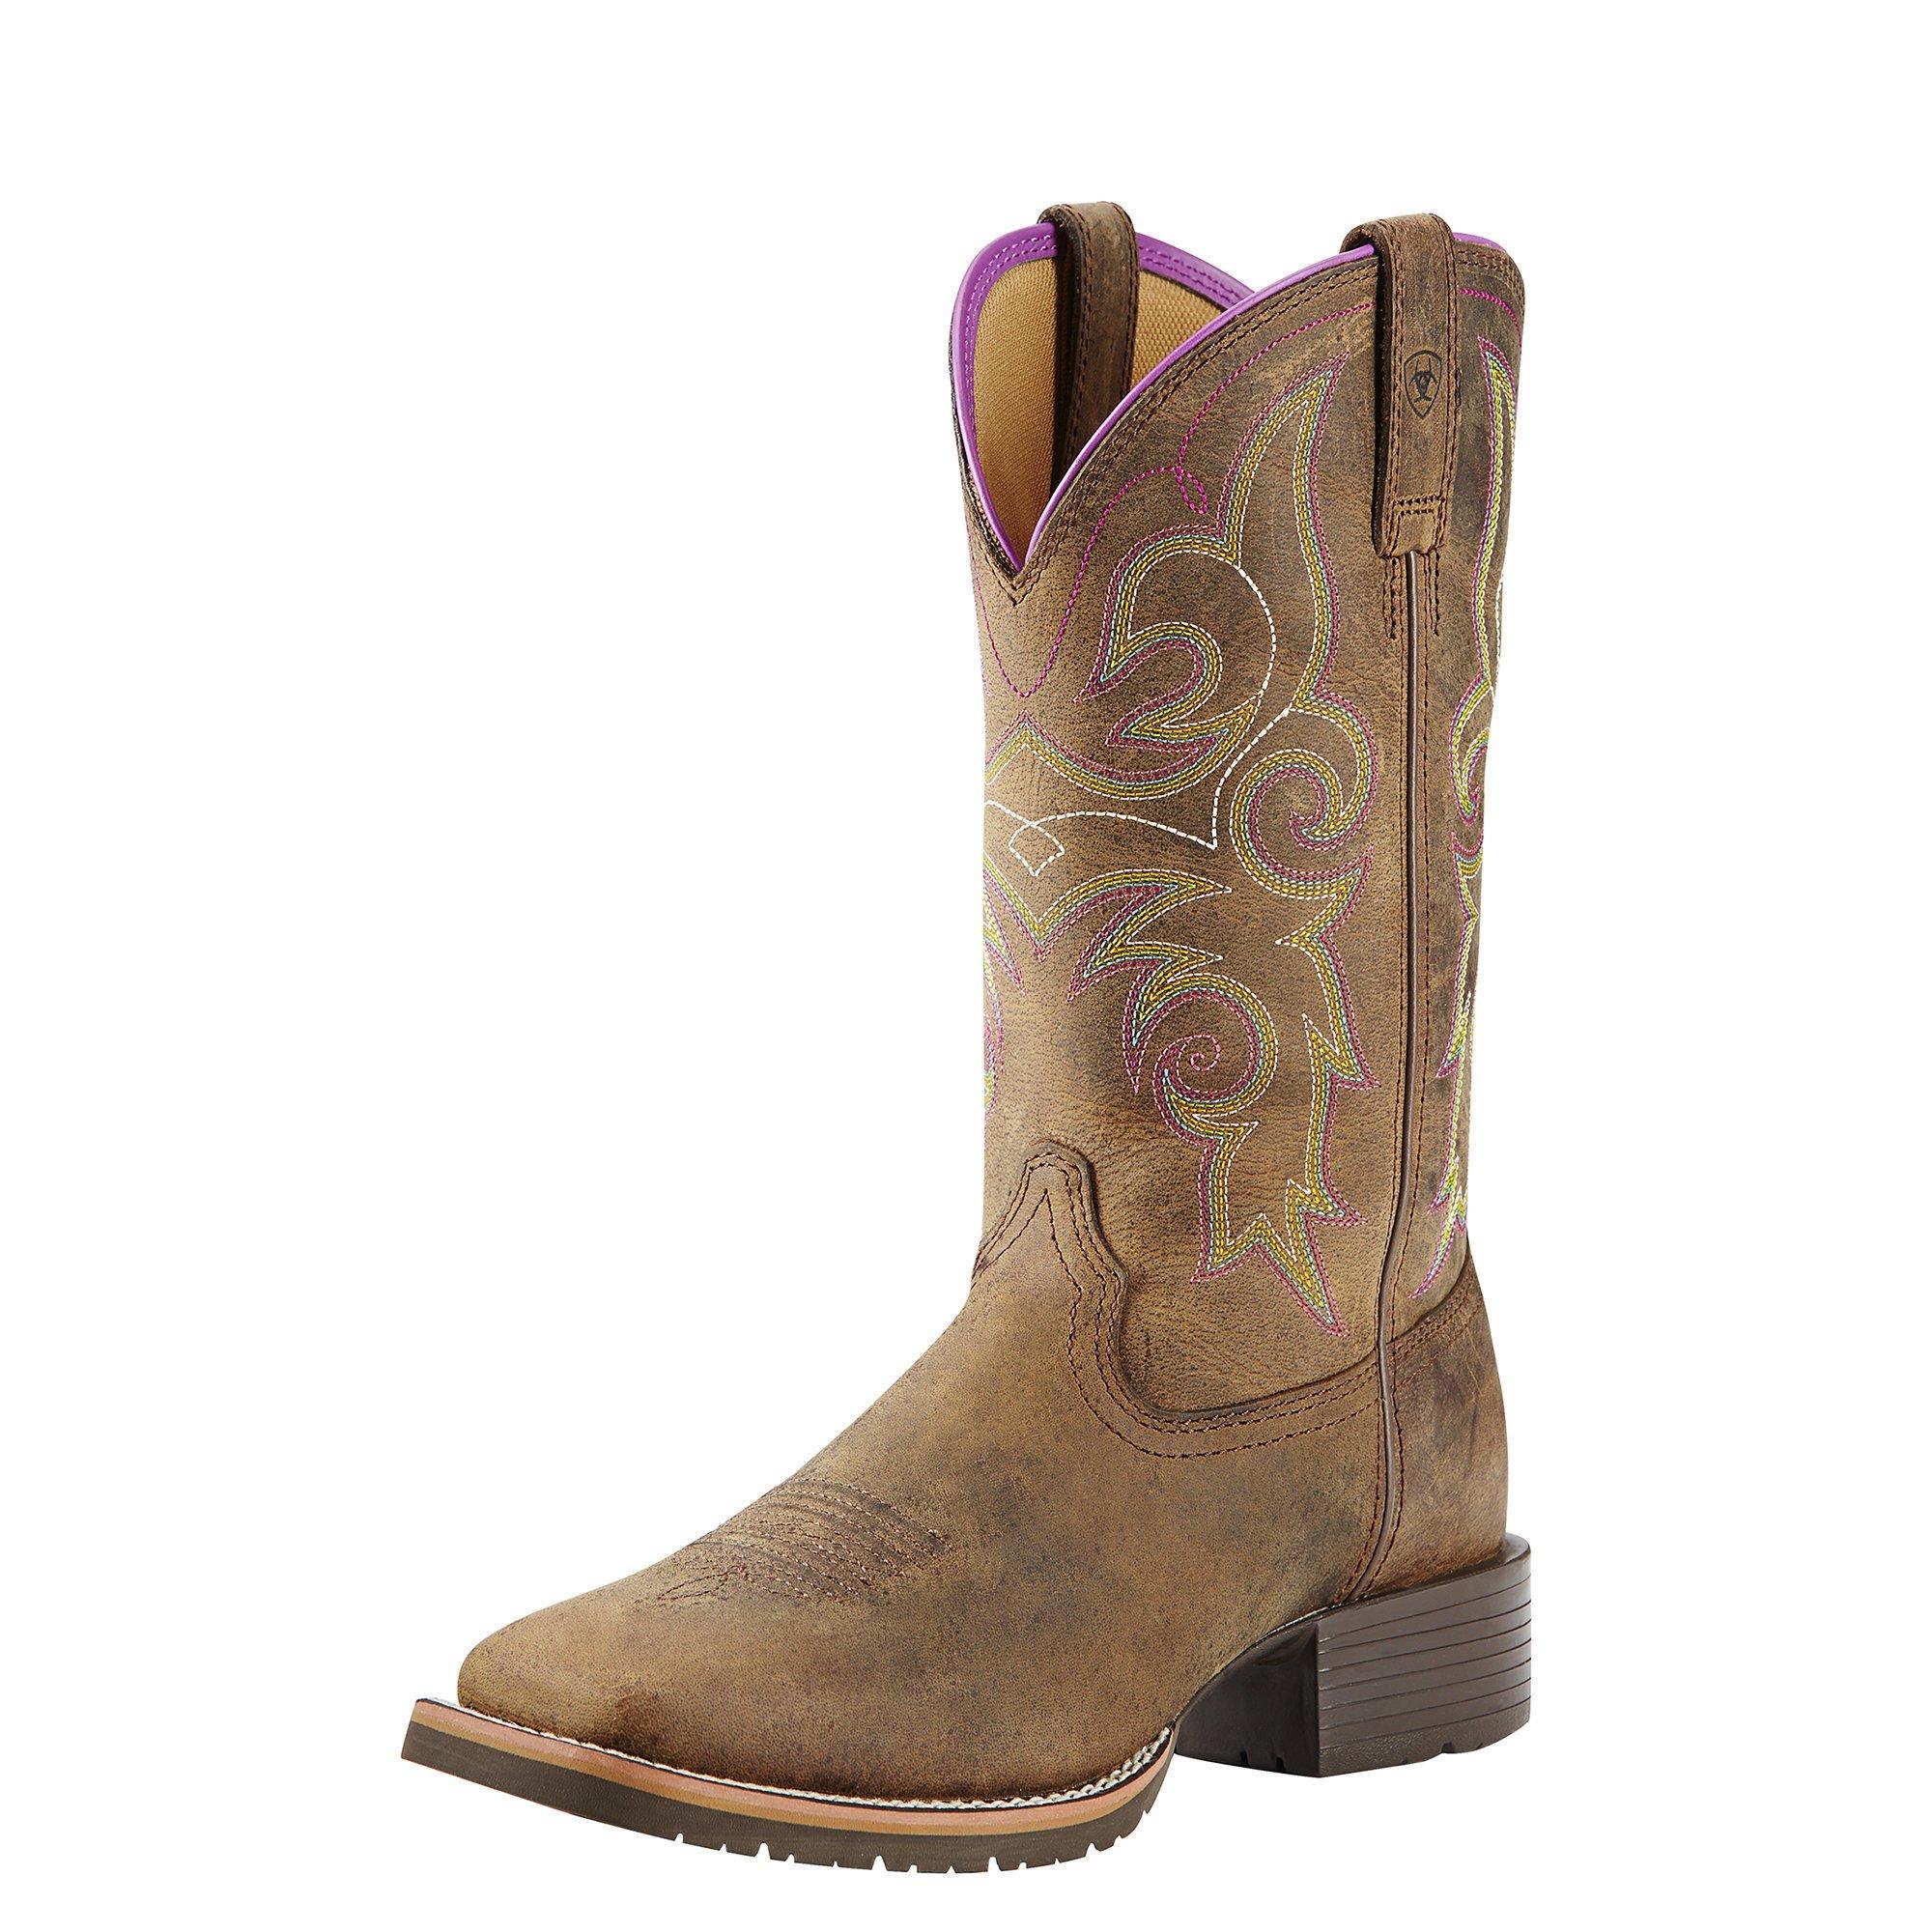 Ariat Women's Hybrid Rancher Western Cowboy Boot, Distressed Brown/Hot Leaf, 9 B US